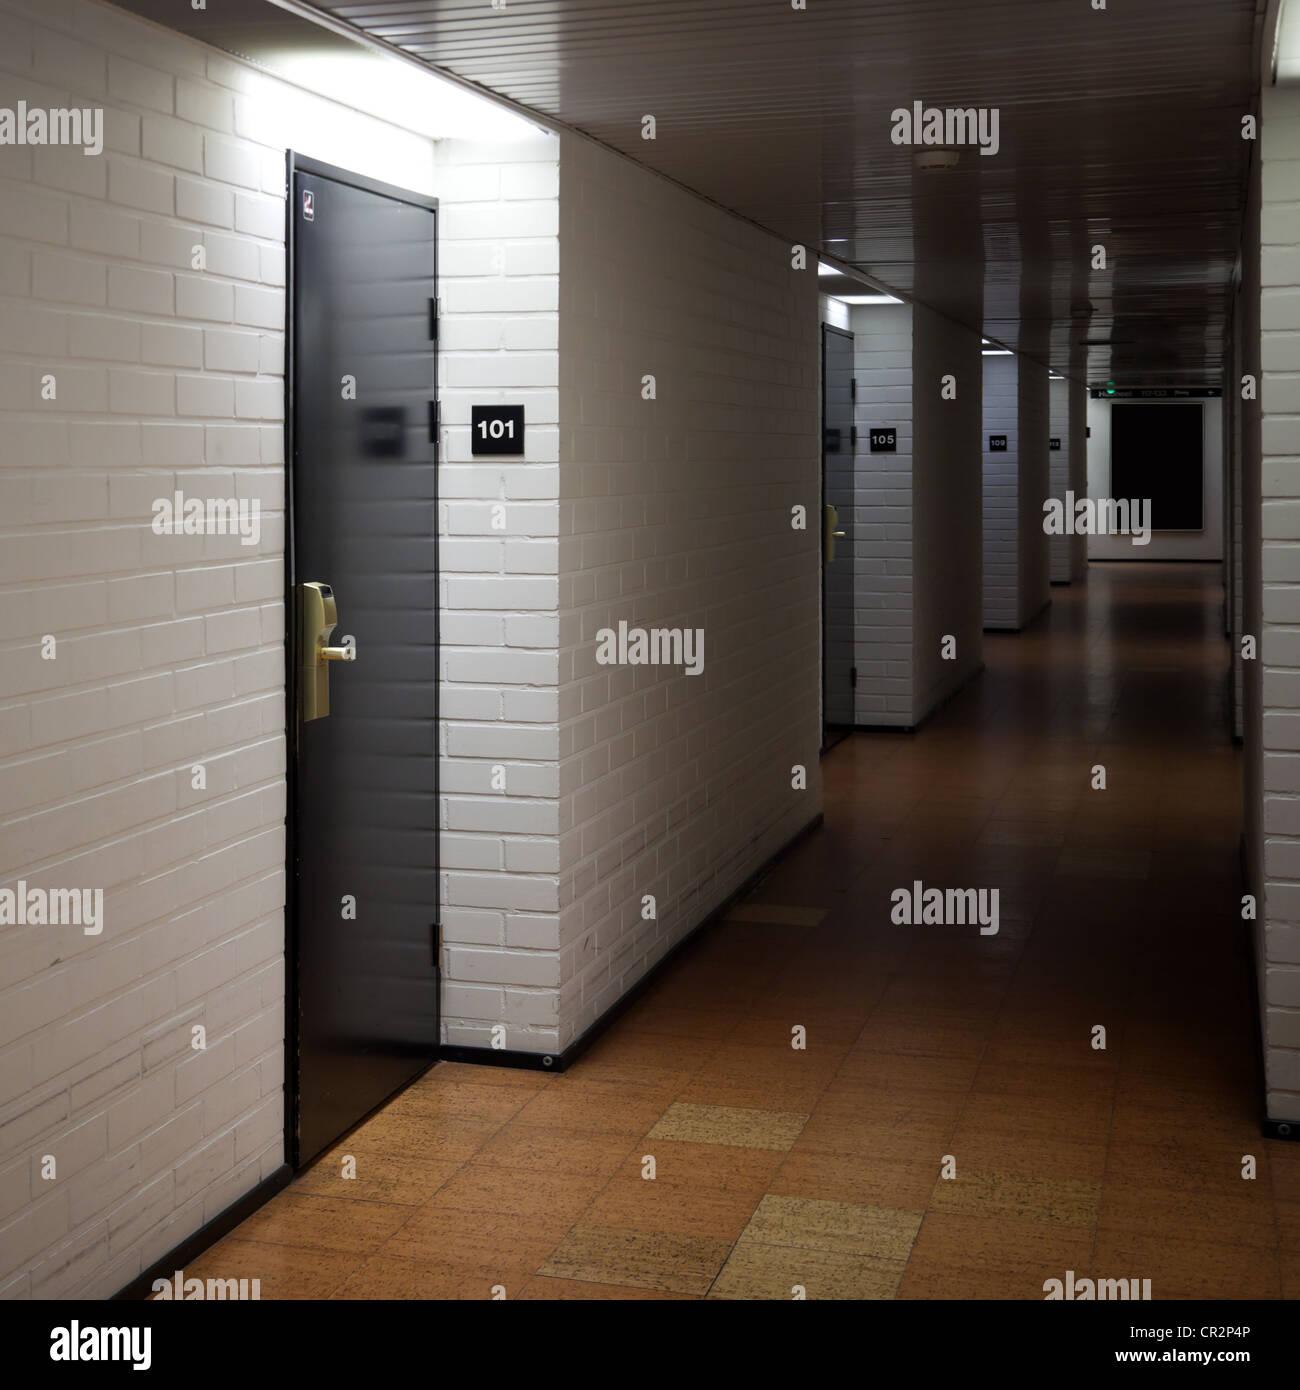 Abstract dark hotel corridor interior with doors and room numbers & Abstract dark hotel corridor interior with doors and room numbers ... pezcame.com